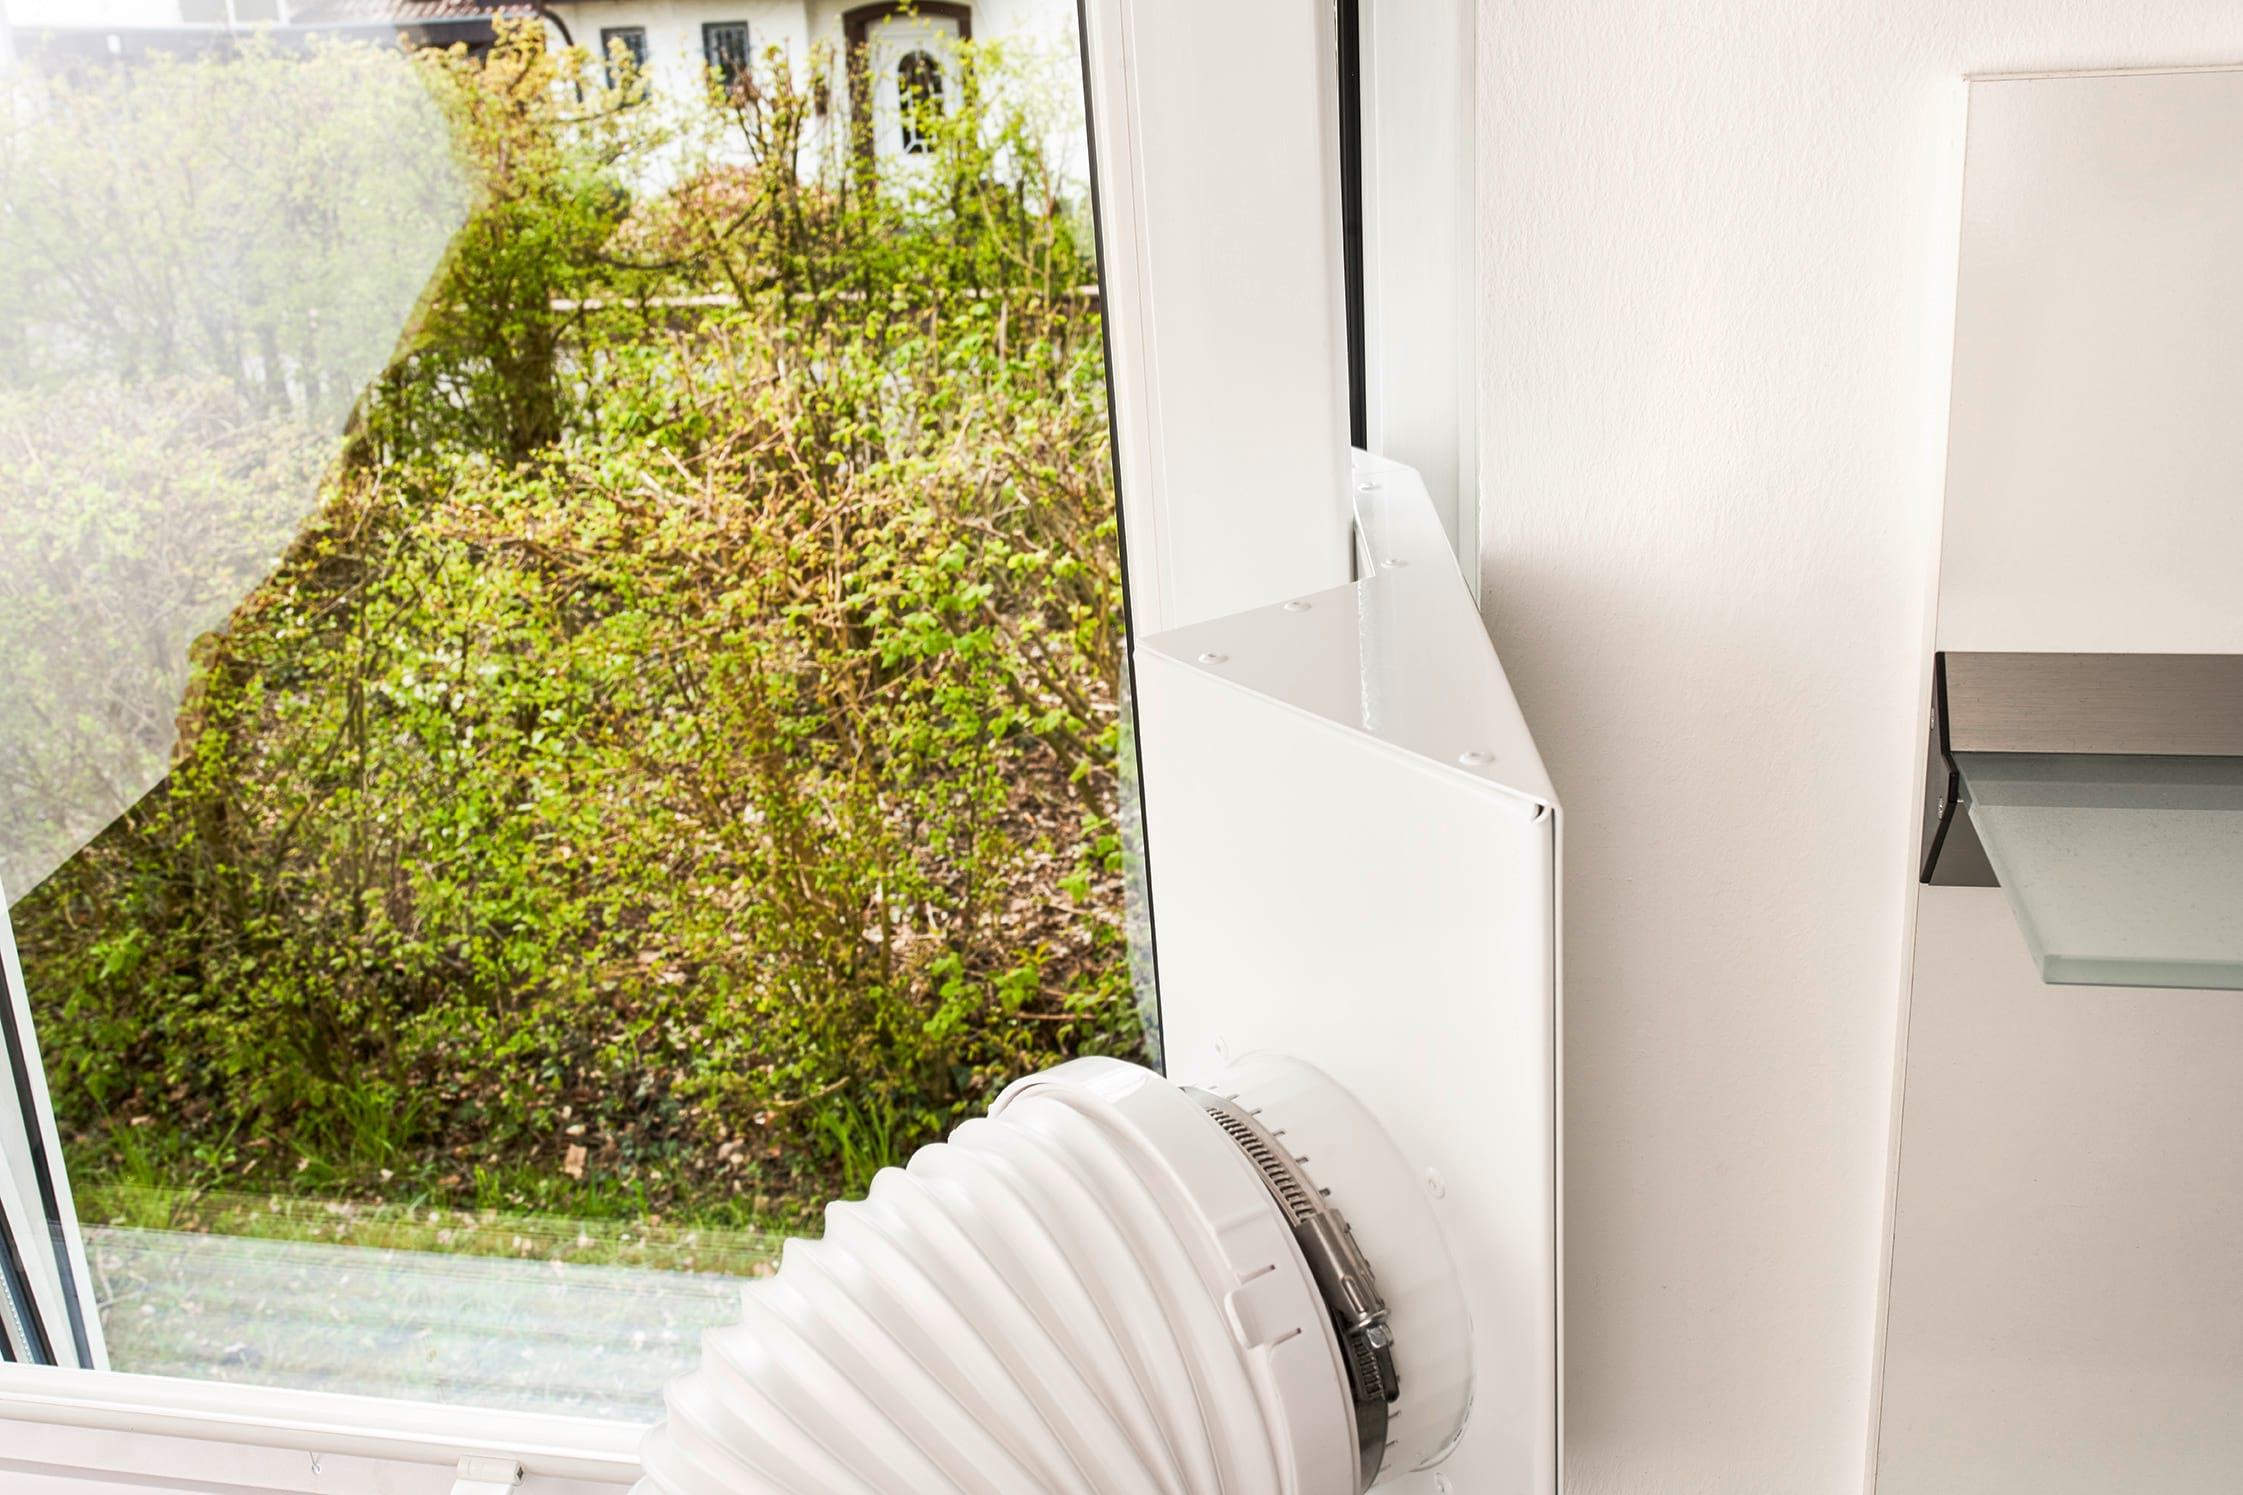 Climia CMK 2600 Sparpaket #5  - Klimagerät inkl. Fensteradapter (2021) & Schutzhülle